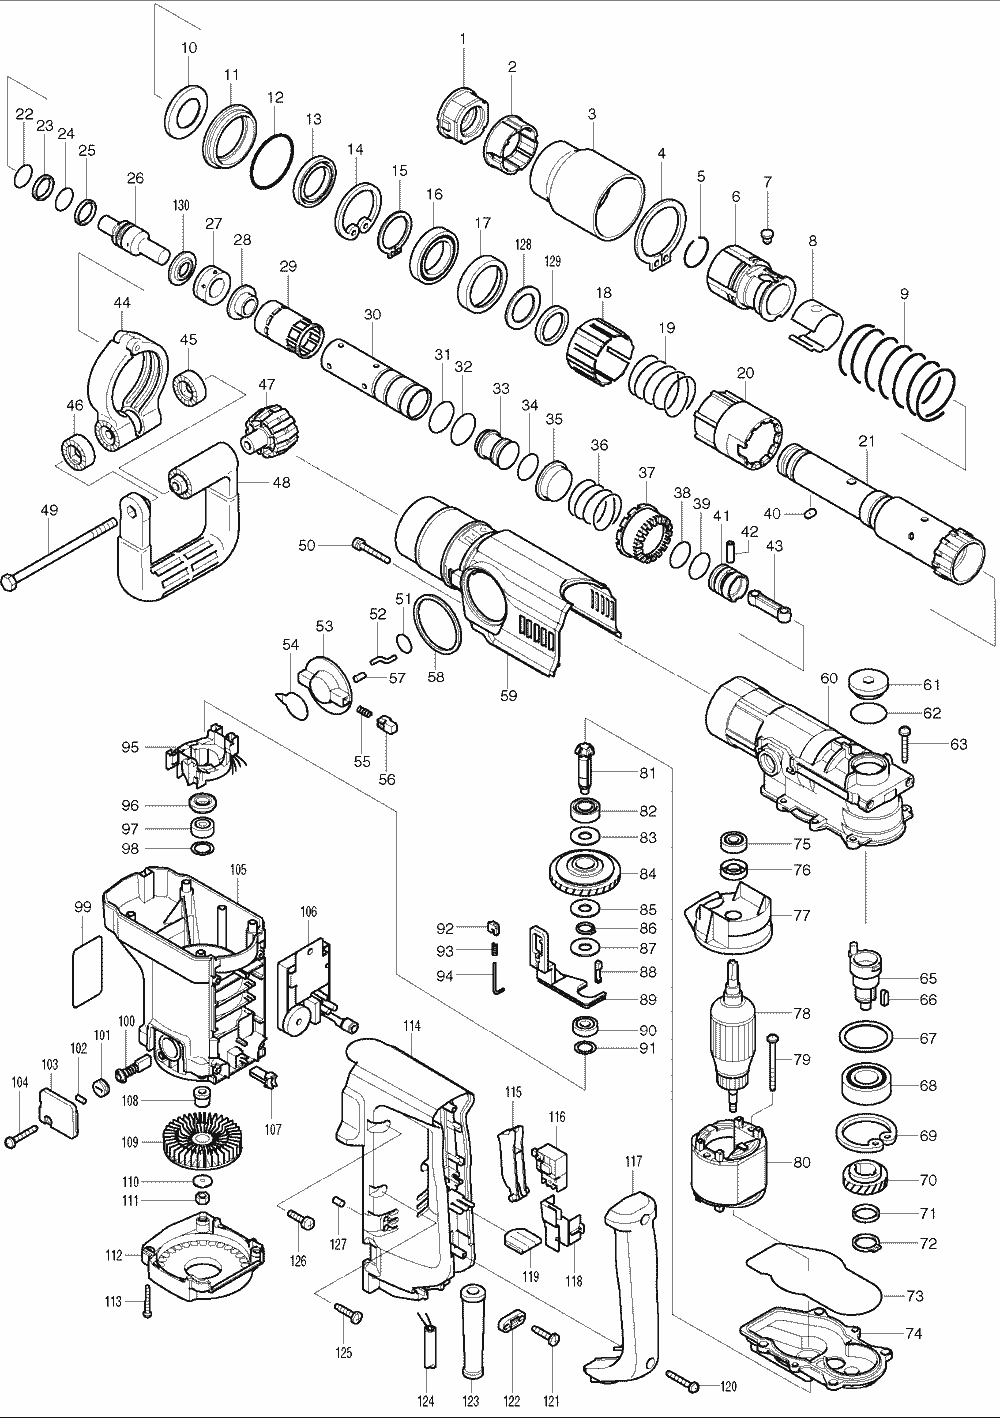 Buy Makita HR4040C 1-9/16 Inch Spline Shank Replacement